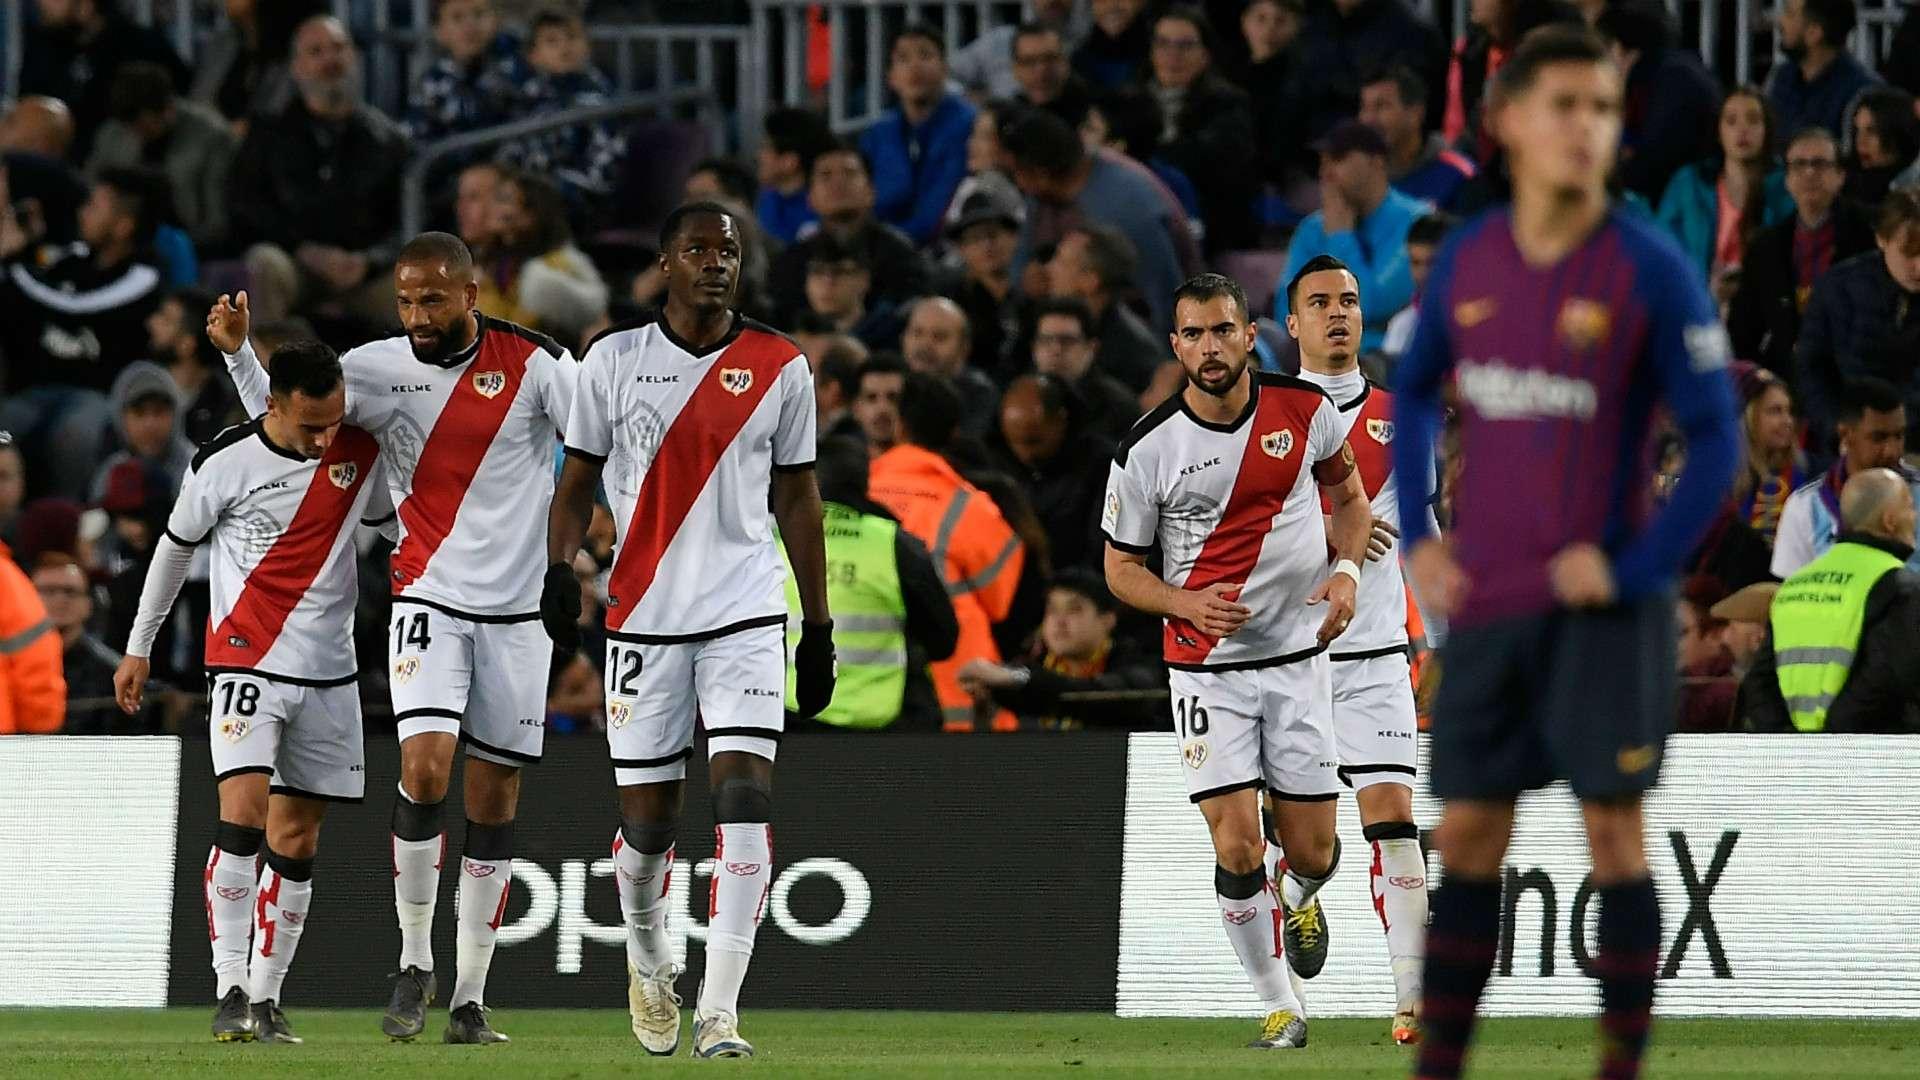 Rayo Vallecano vs Real Madrid Betting Tips: Latest odds, team news